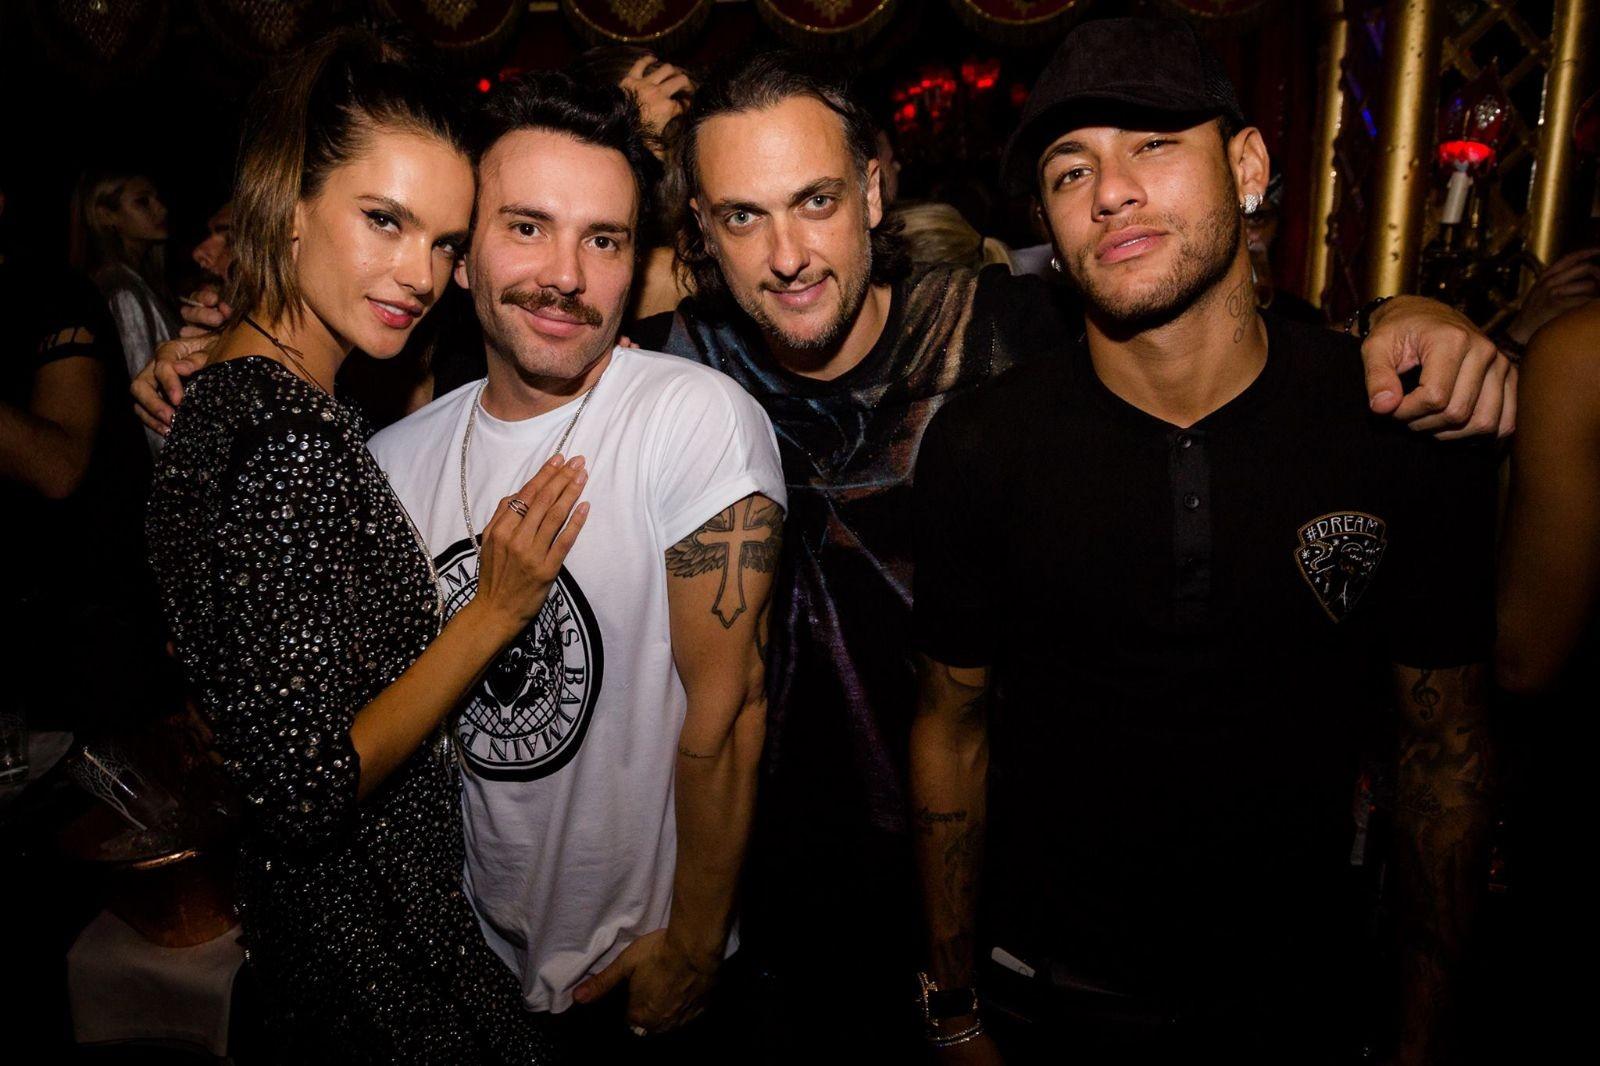 Neymar, Alessandra Ambrósio e Matheus Mazzafera curtem noitada em Paris (Foto: Jean-Christophe Roy)